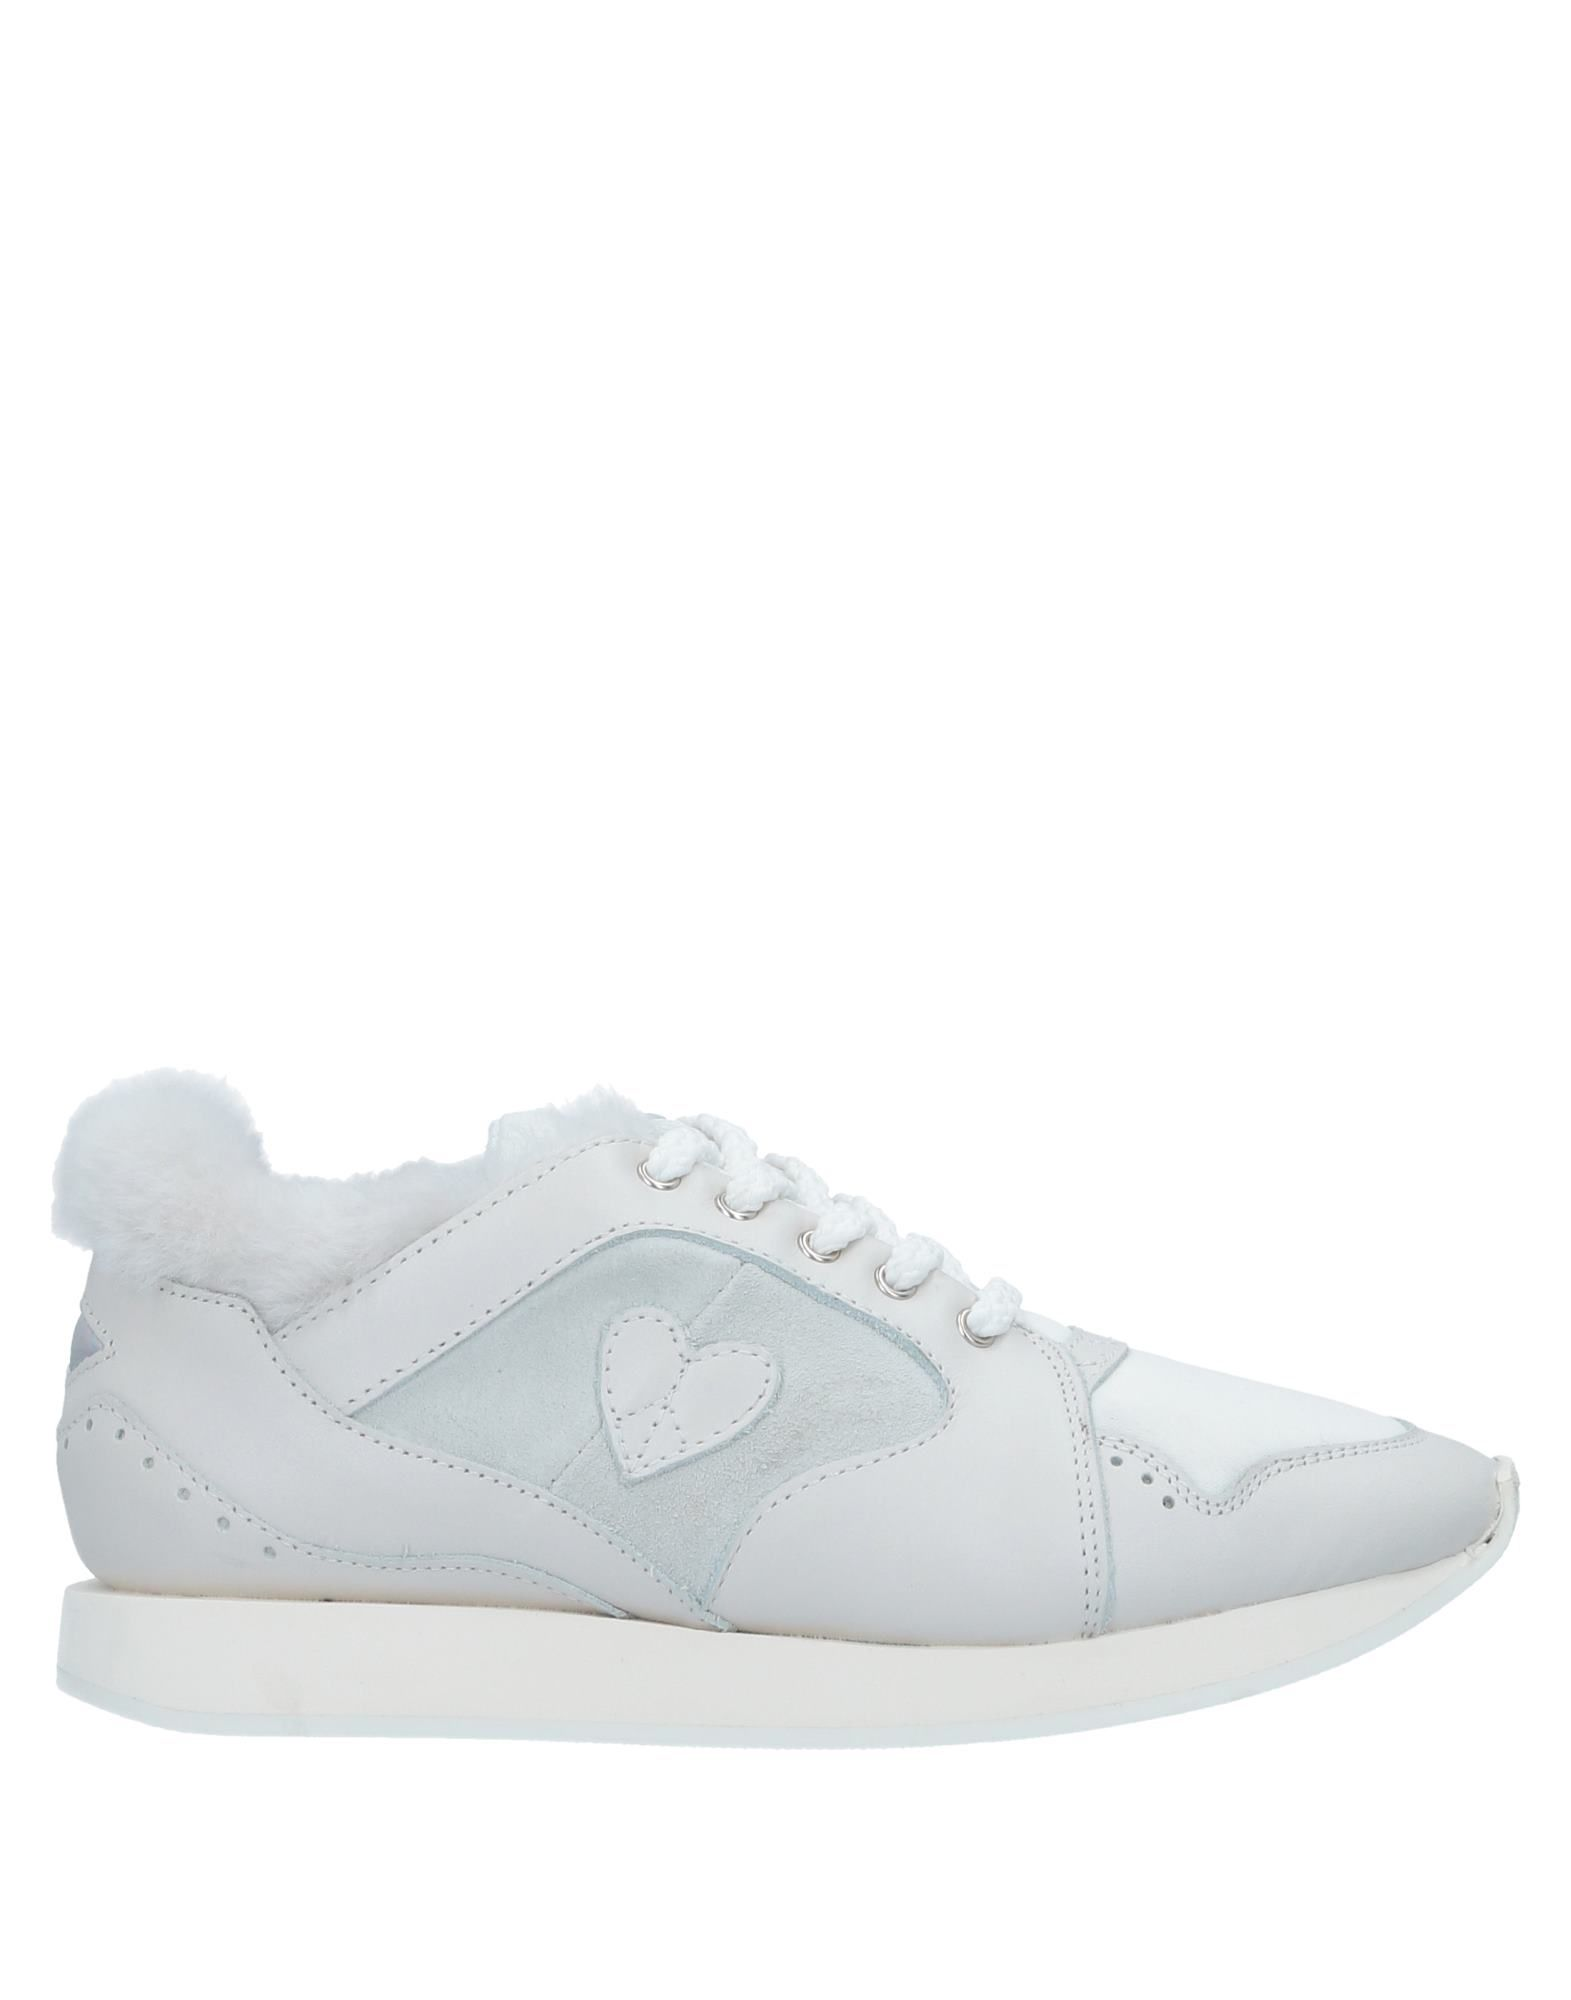 Moda Sneakers Dolfie Donna Donna Dolfie - 11529056OL 5a6033